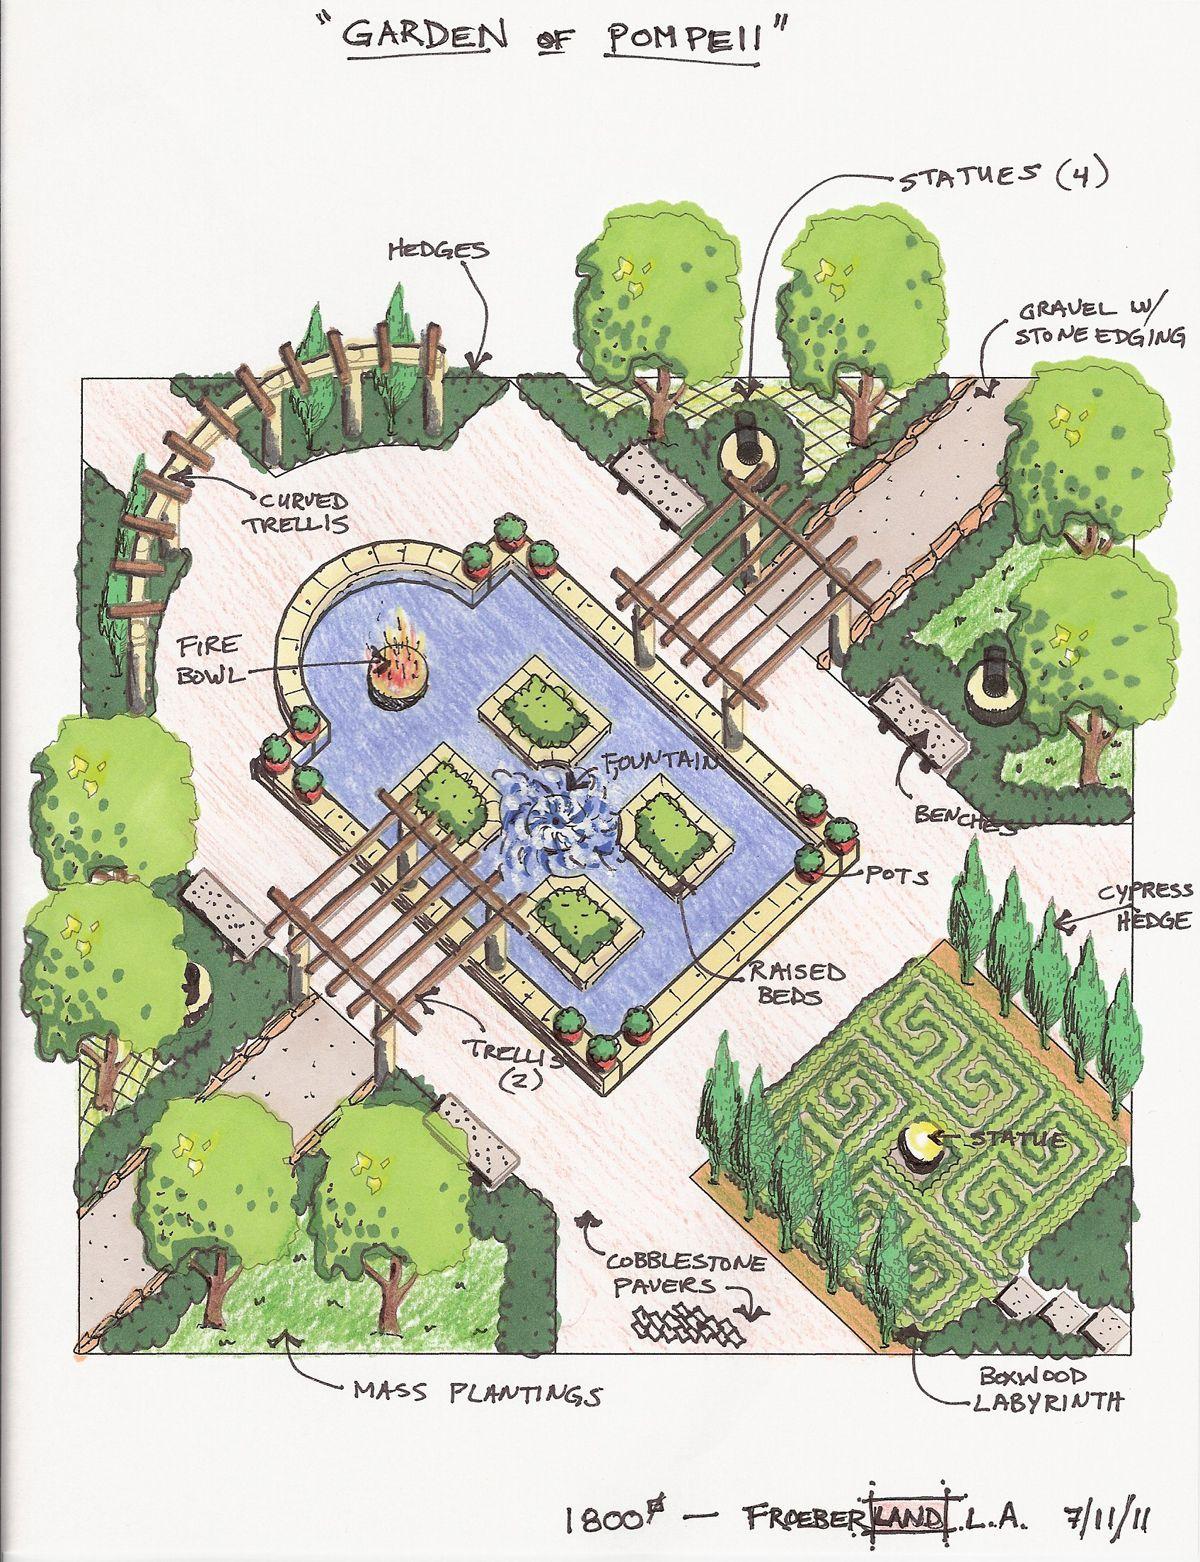 I could handle this garden layout. | Garden | Pinterest | Gardens ...